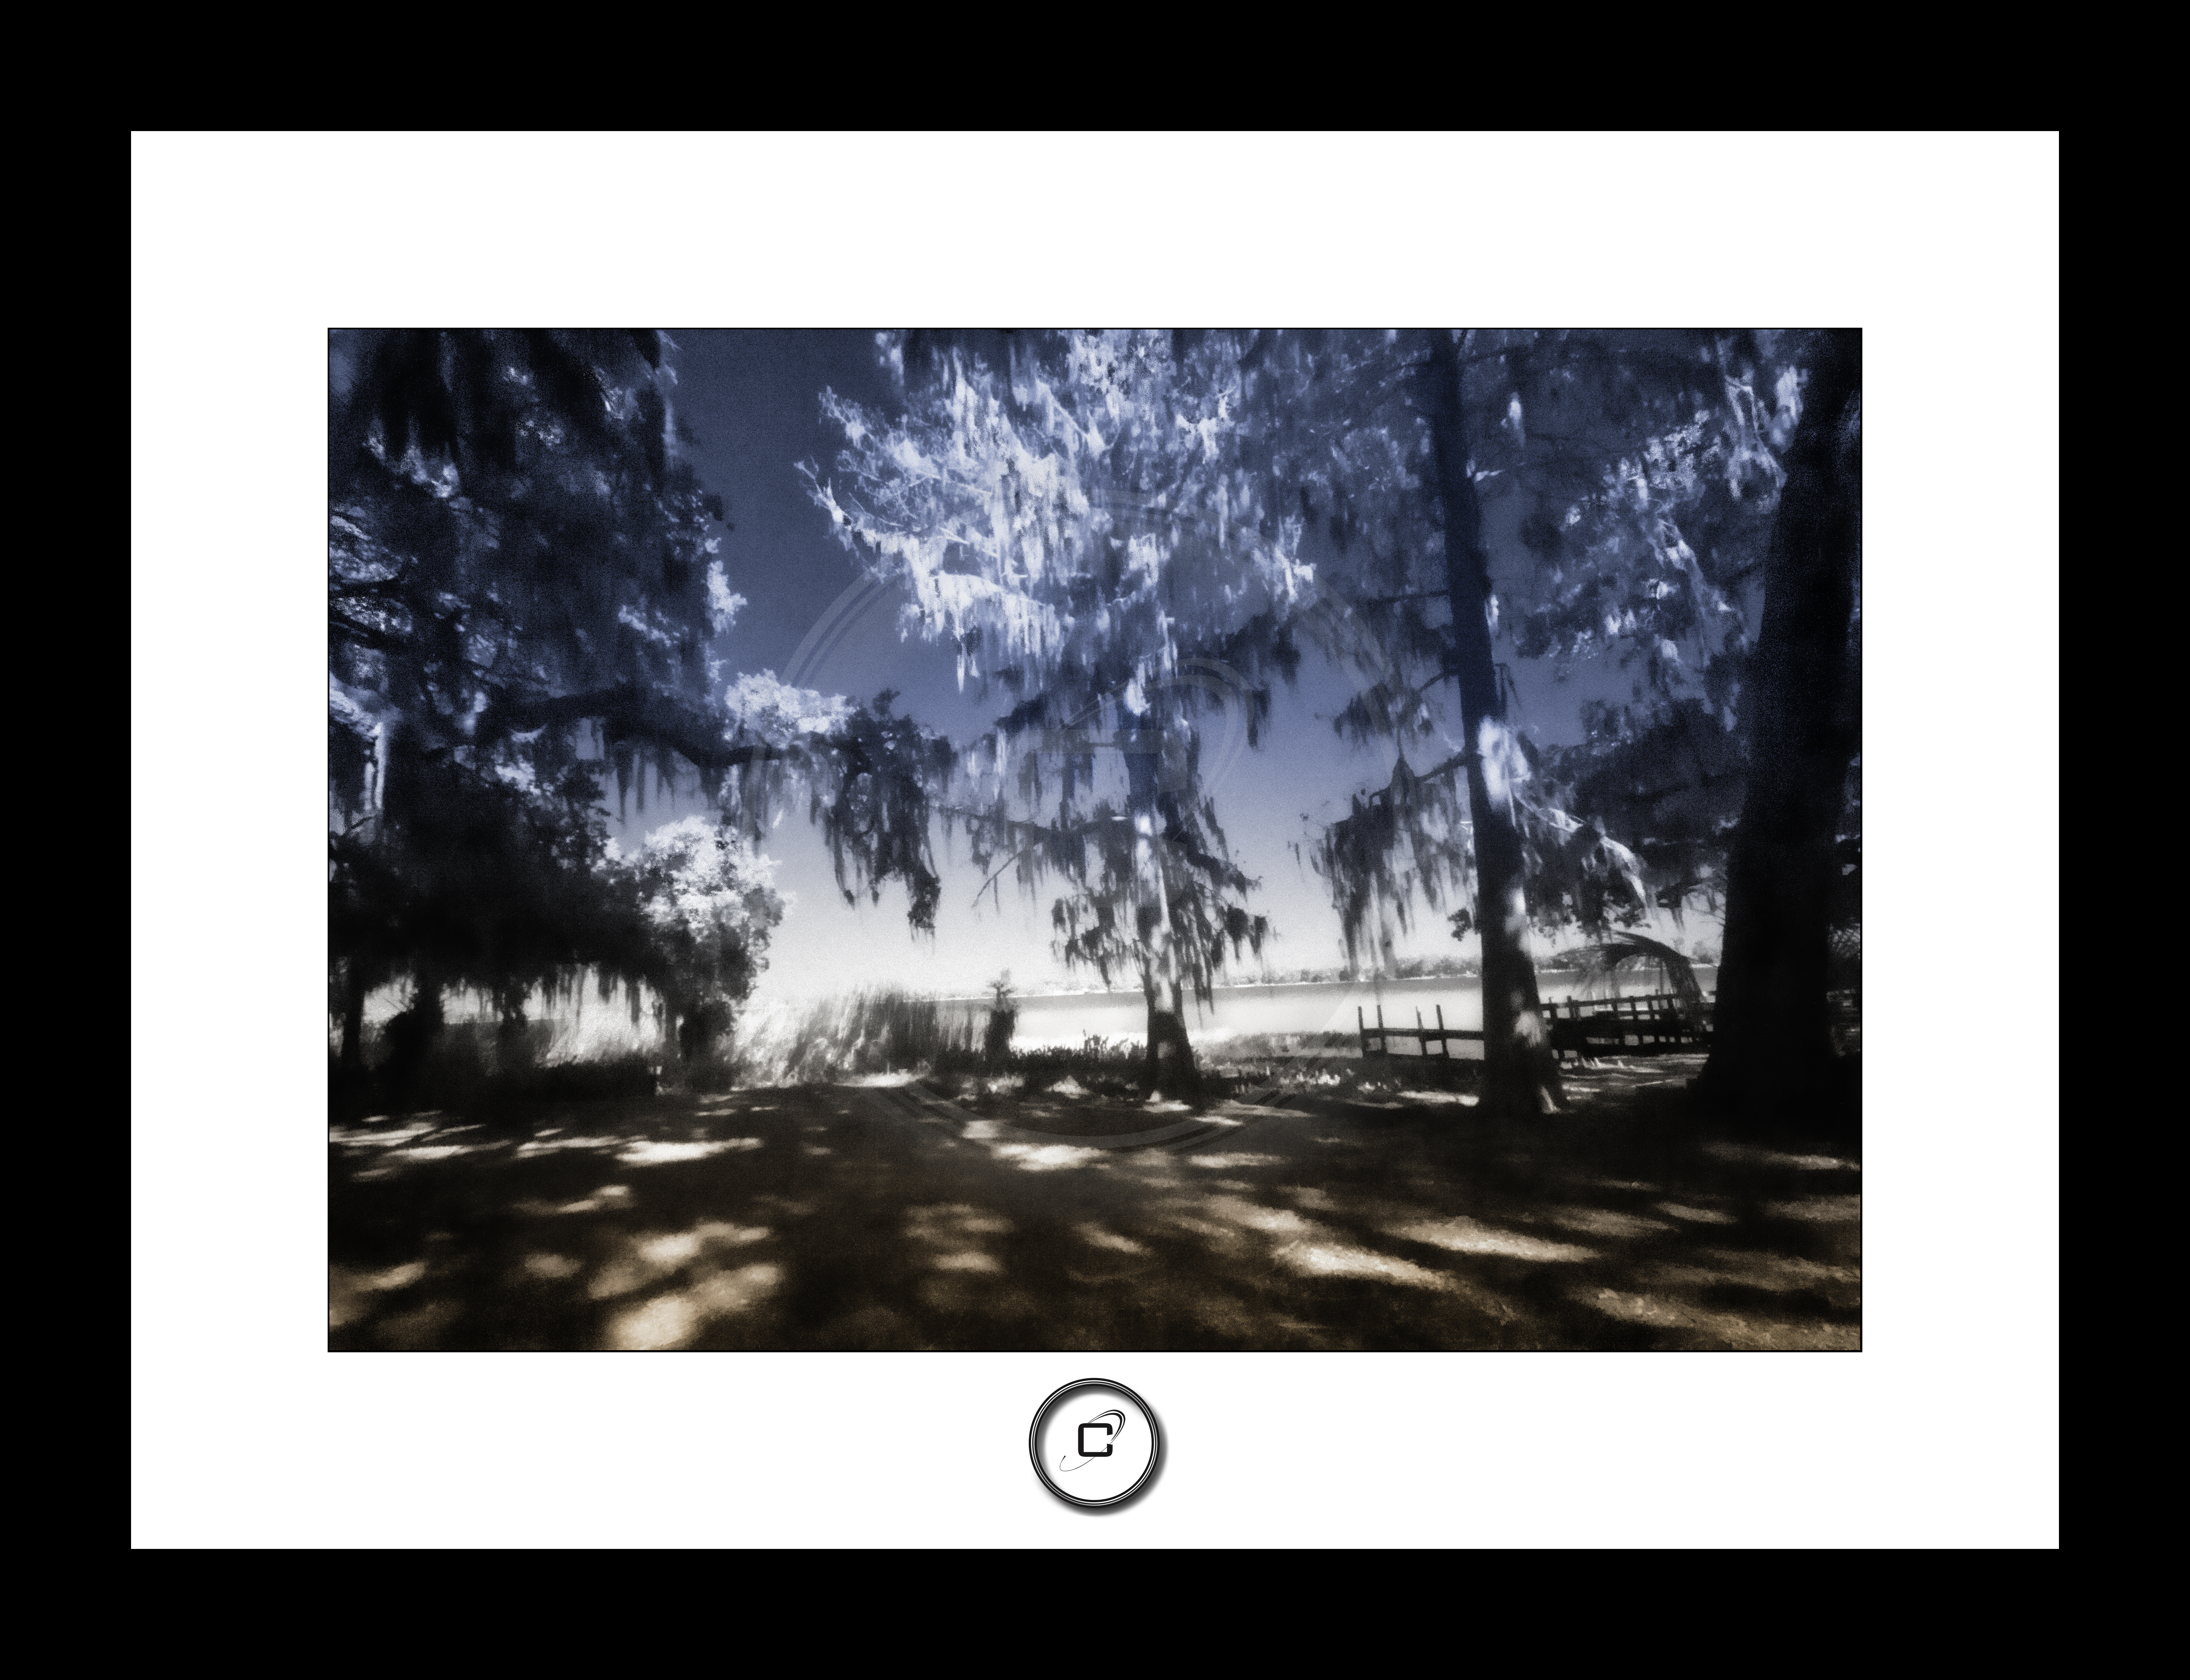 IMG_5528-Edit-Edit-2